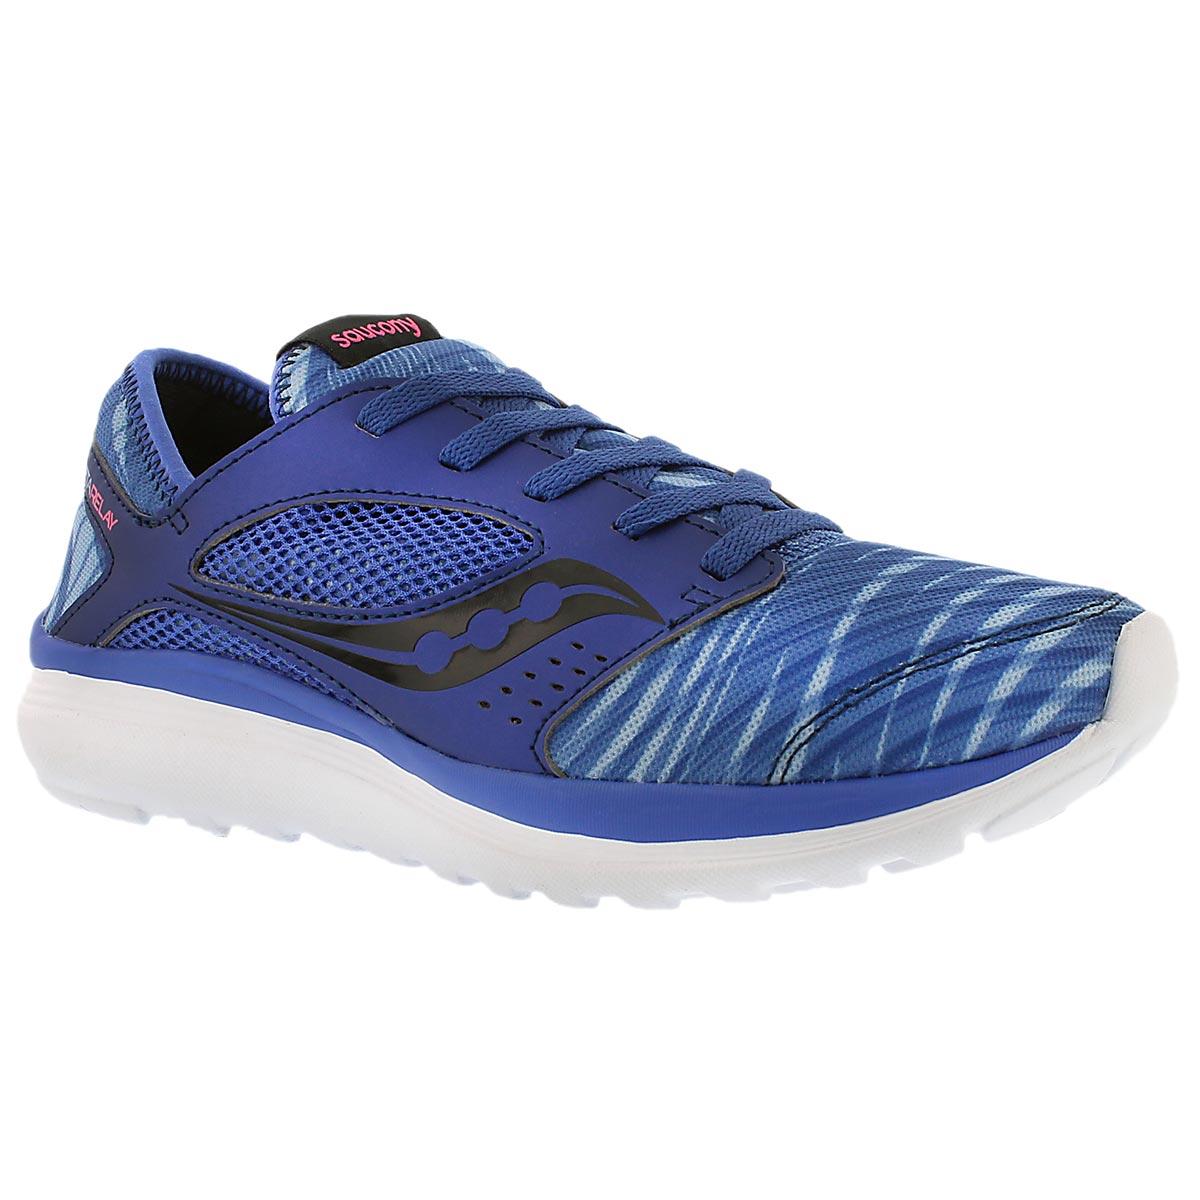 Chaussures course KinetaRelay, bleu, fem